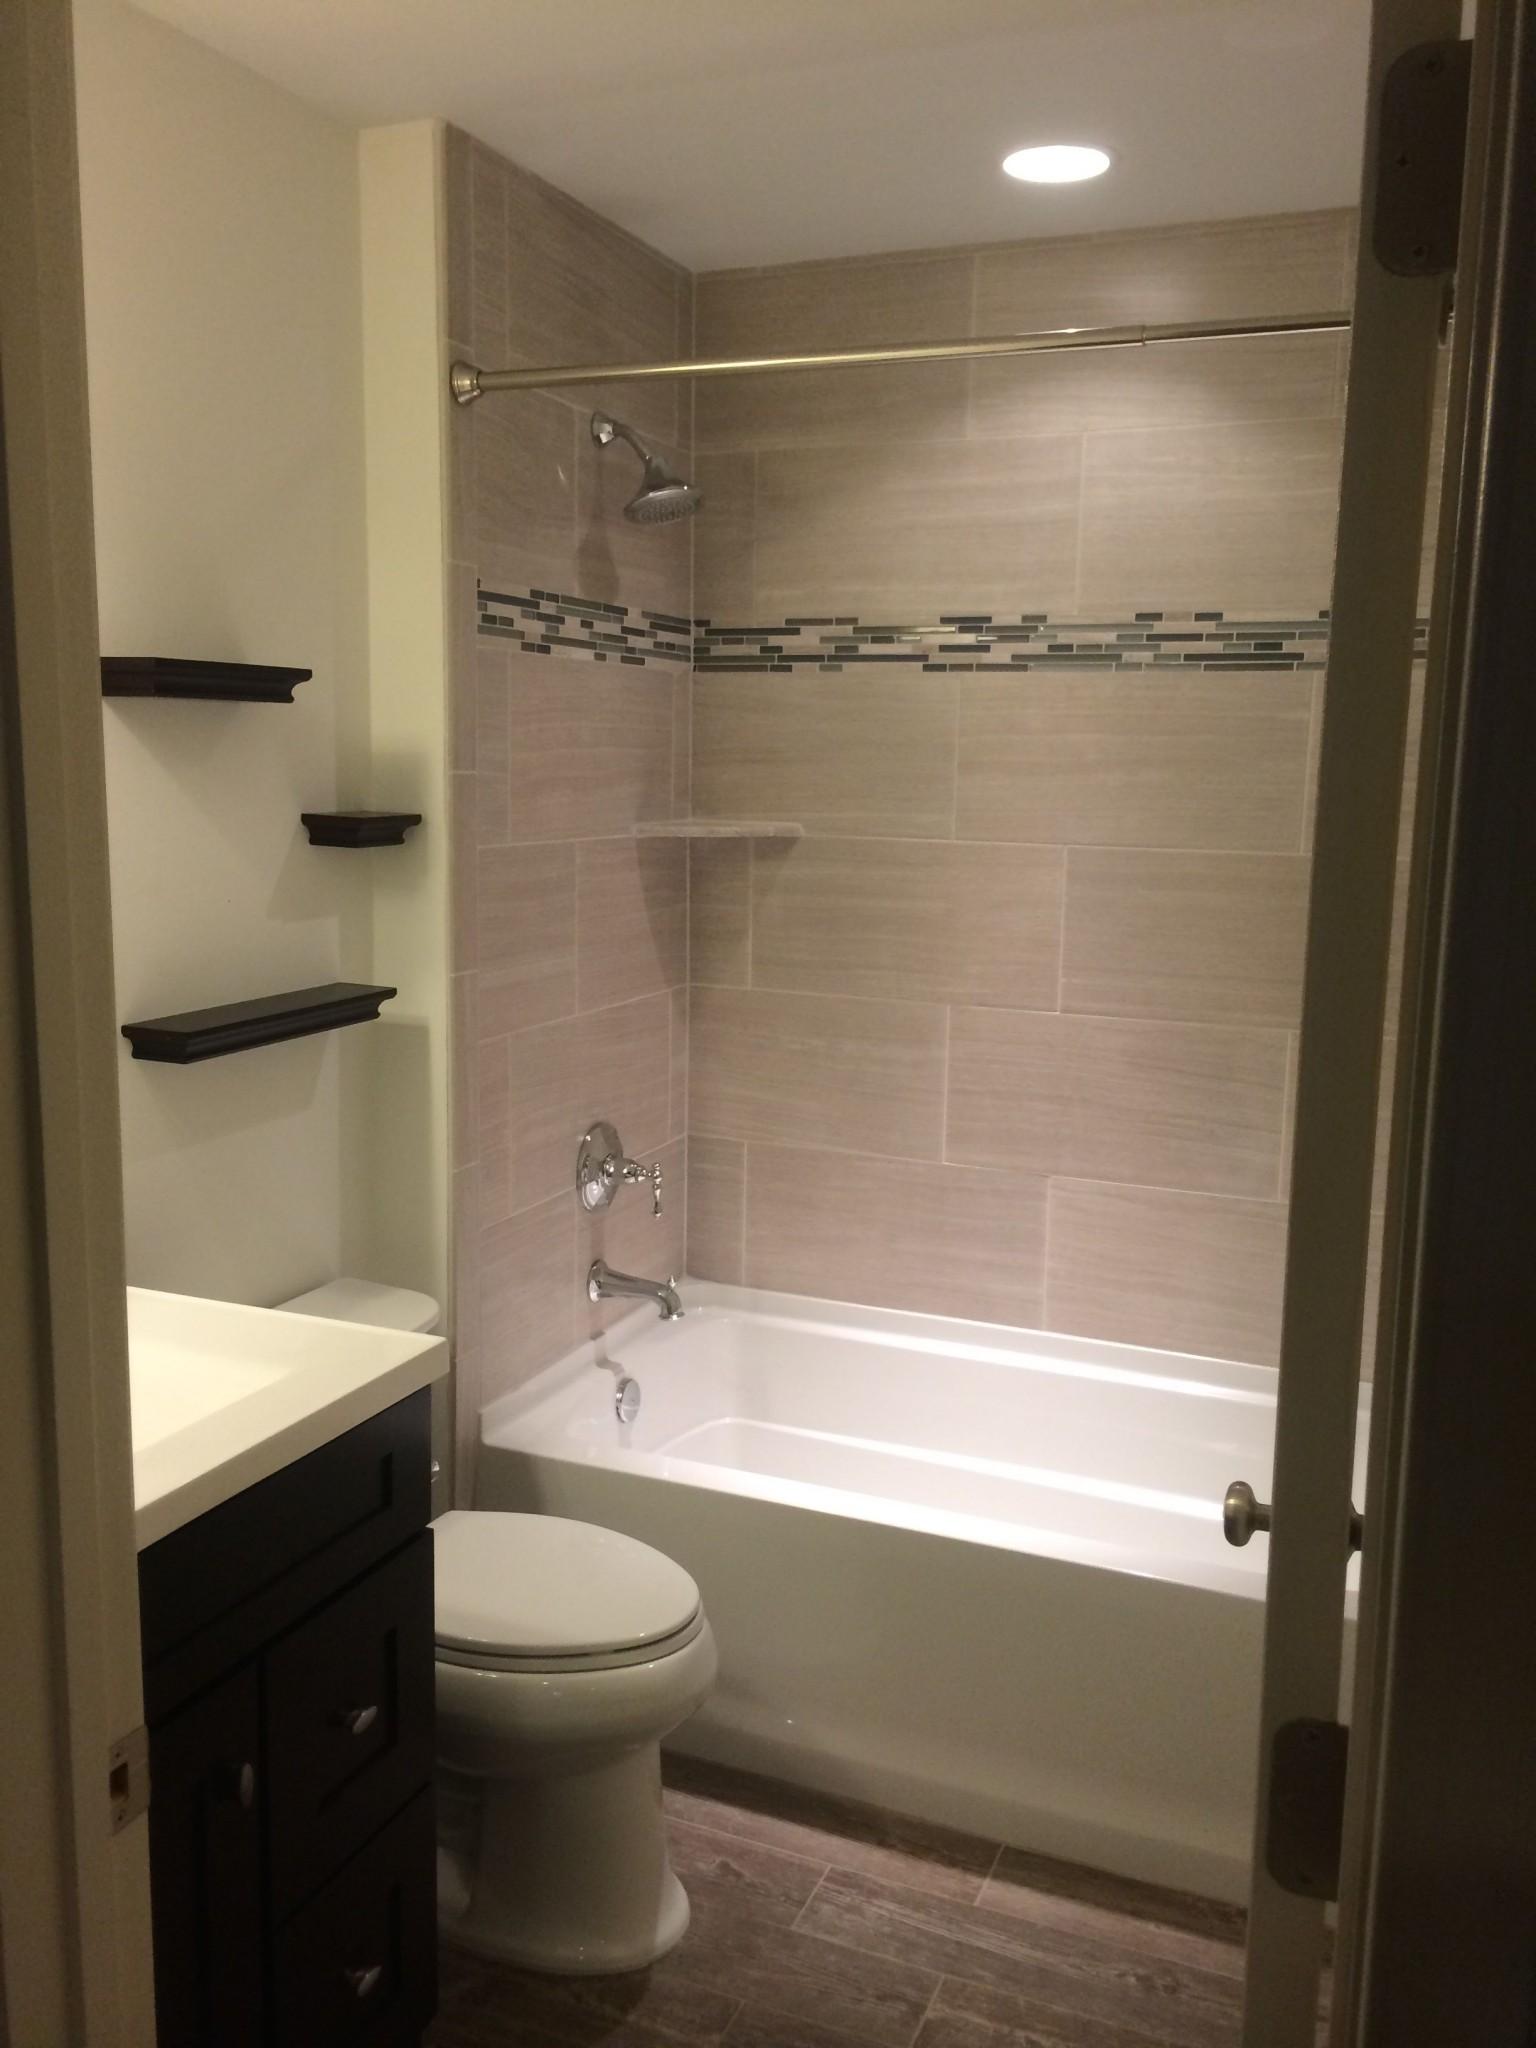 Photos of Bathroom Remodel in Ashburn